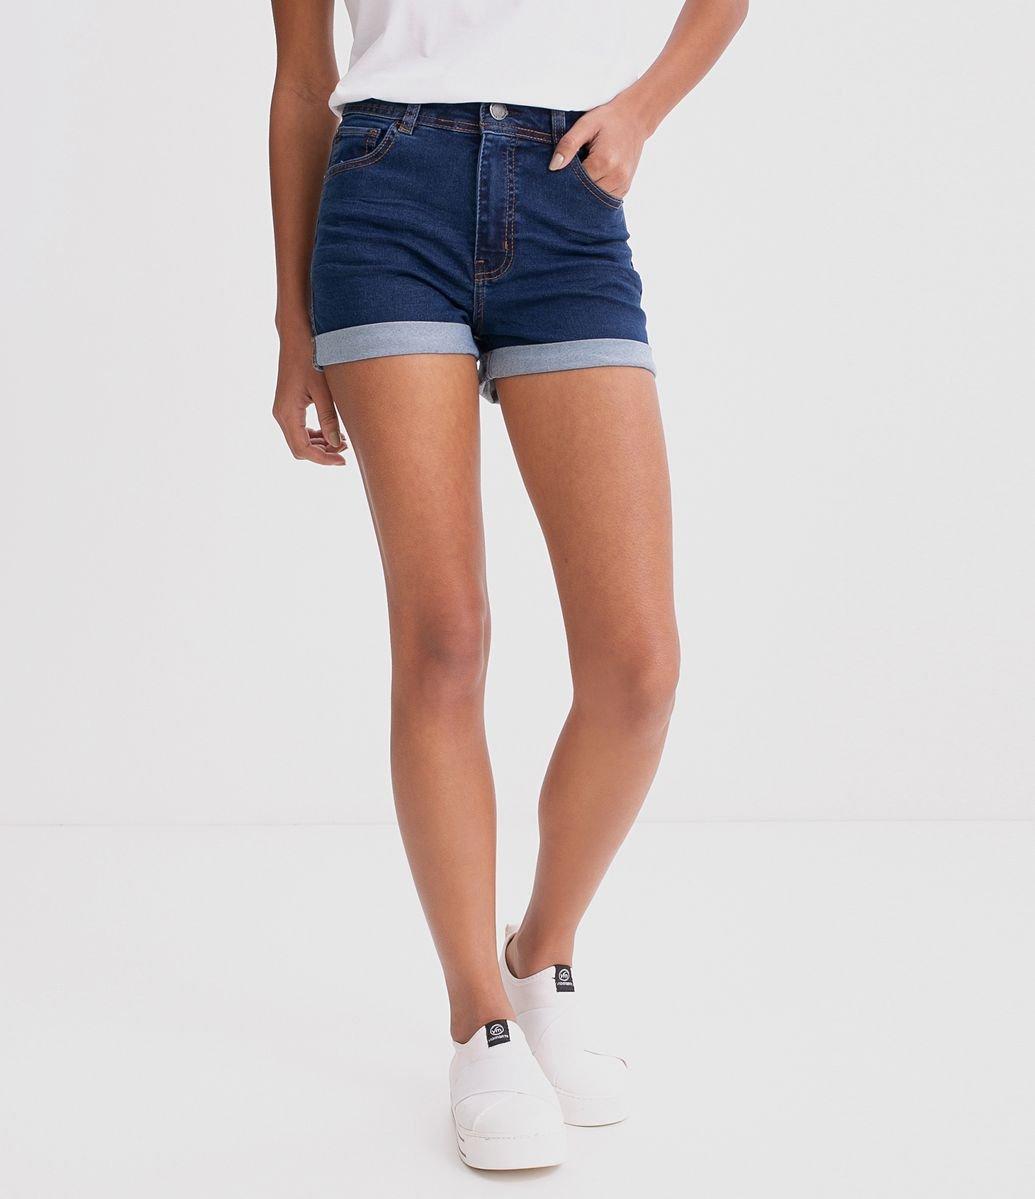 bcba50567 Short Jeans Hot Pants com Barra Dobrada - Renner